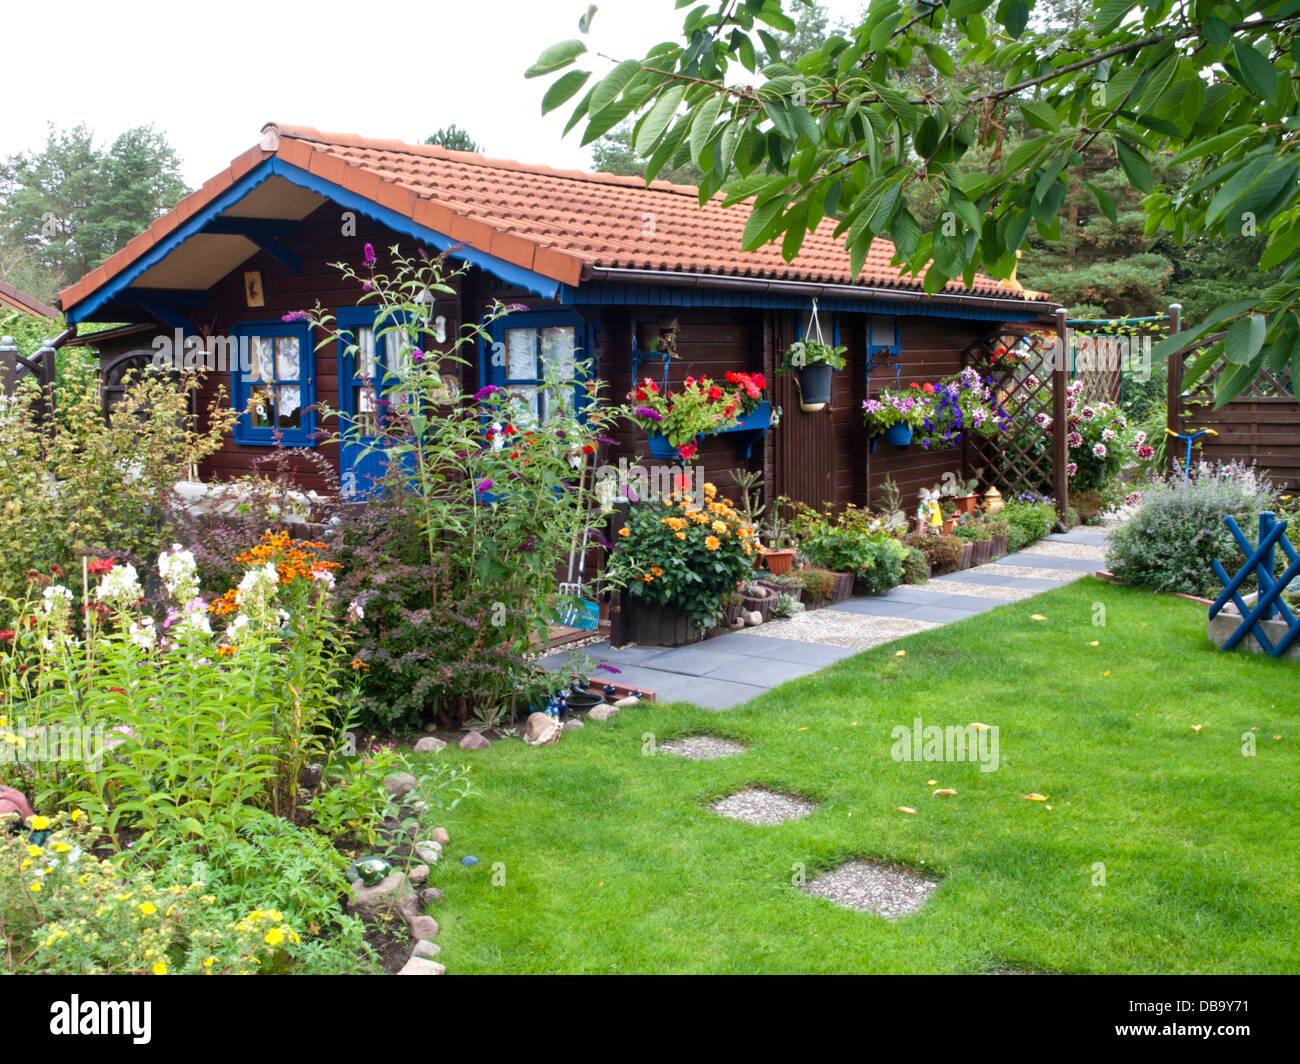 Wooden Garden House In An Allotment Garden Stock Photo